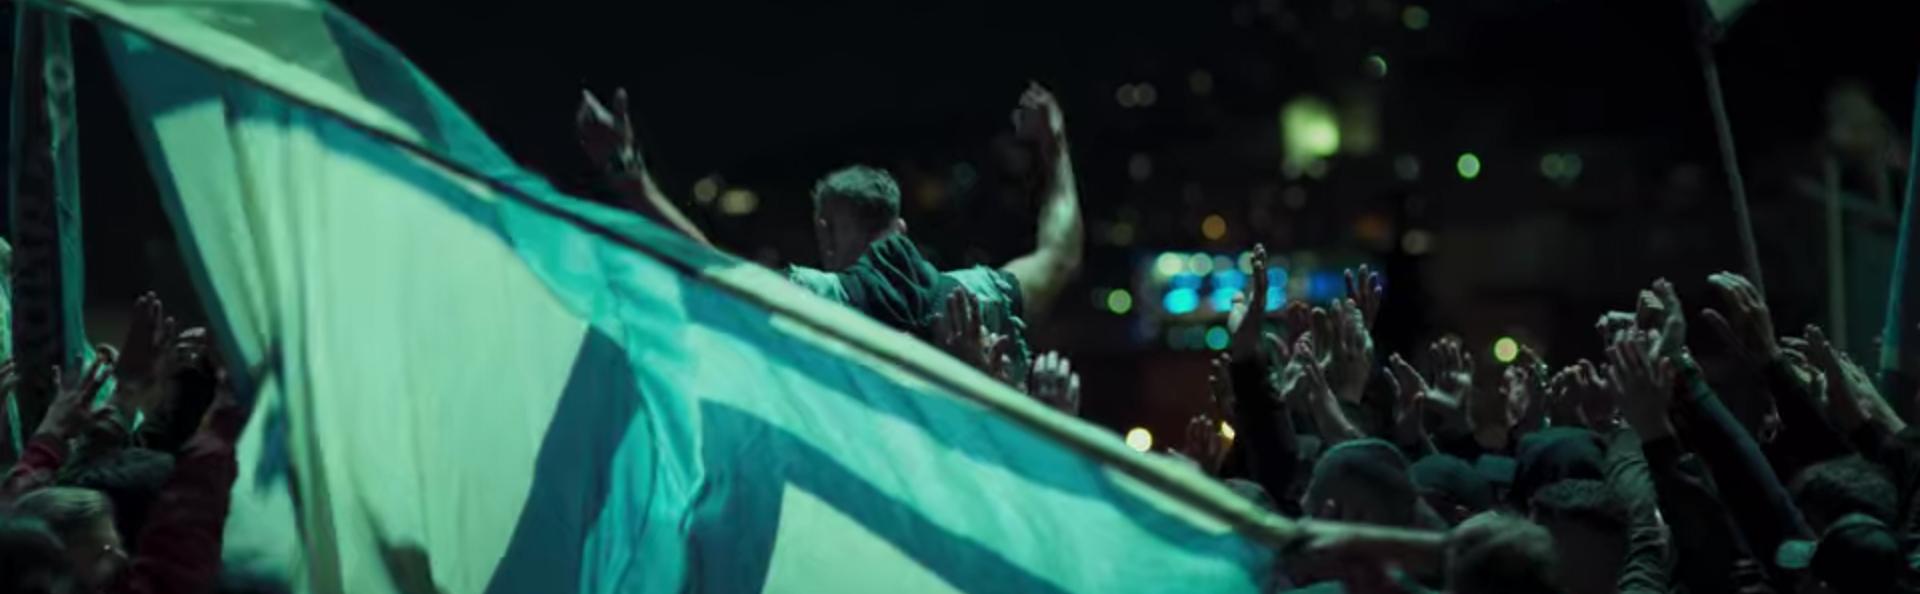 Ultras. Image Credit: Netflix.